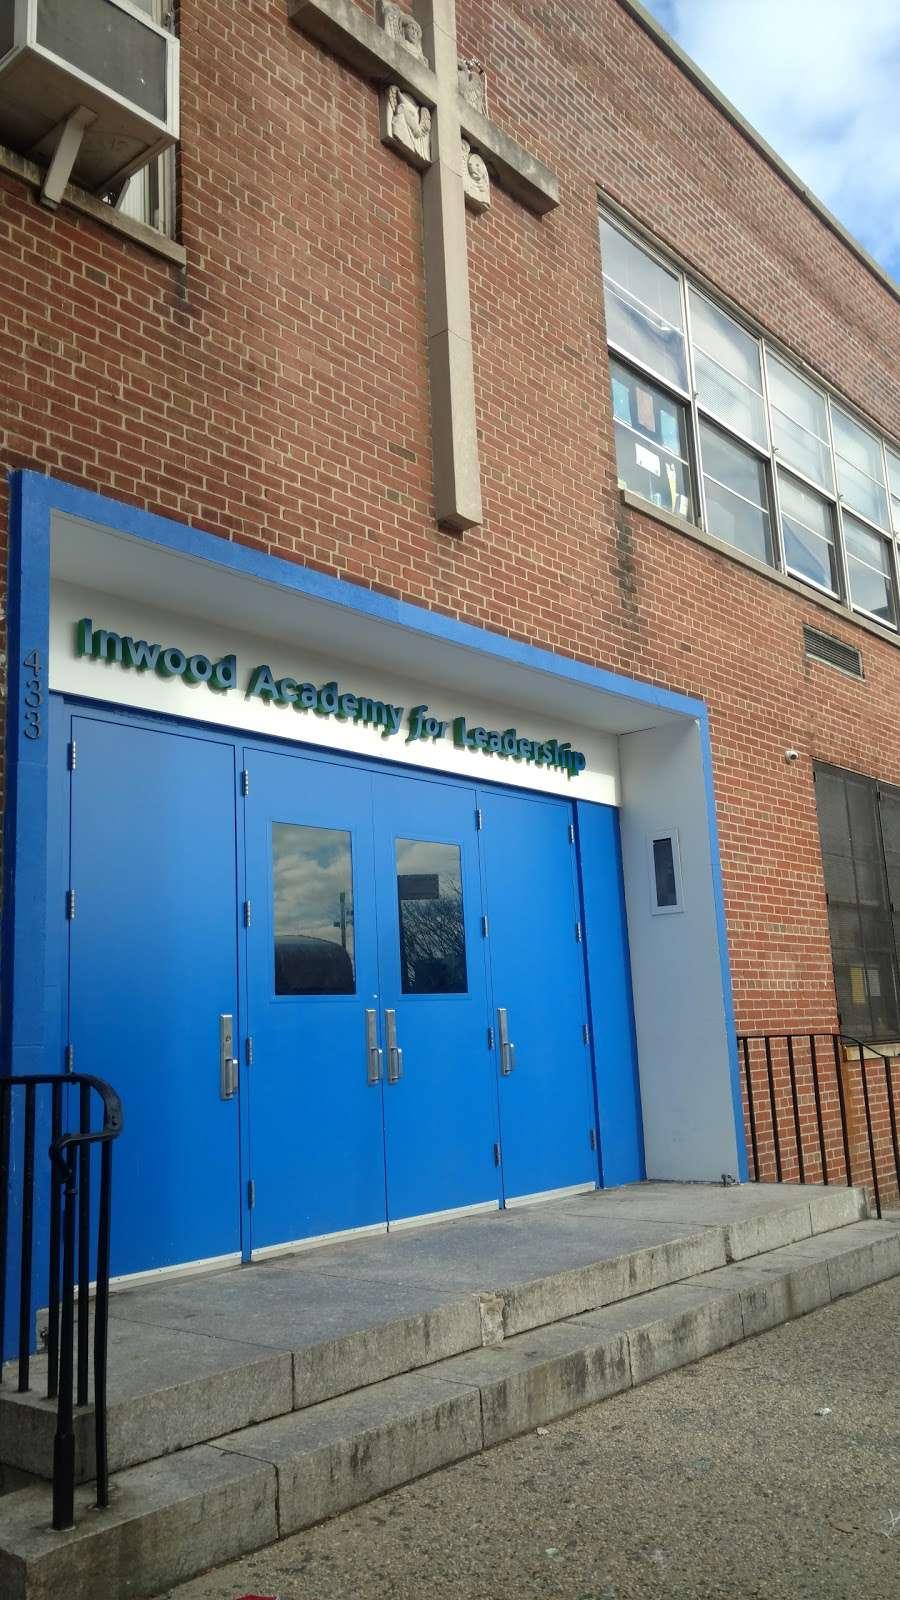 Inwood Academy for Leadership Charter School - school  | Photo 6 of 10 | Address: 433 W 204th St, New York, NY 10034, USA | Phone: (646) 665-5570